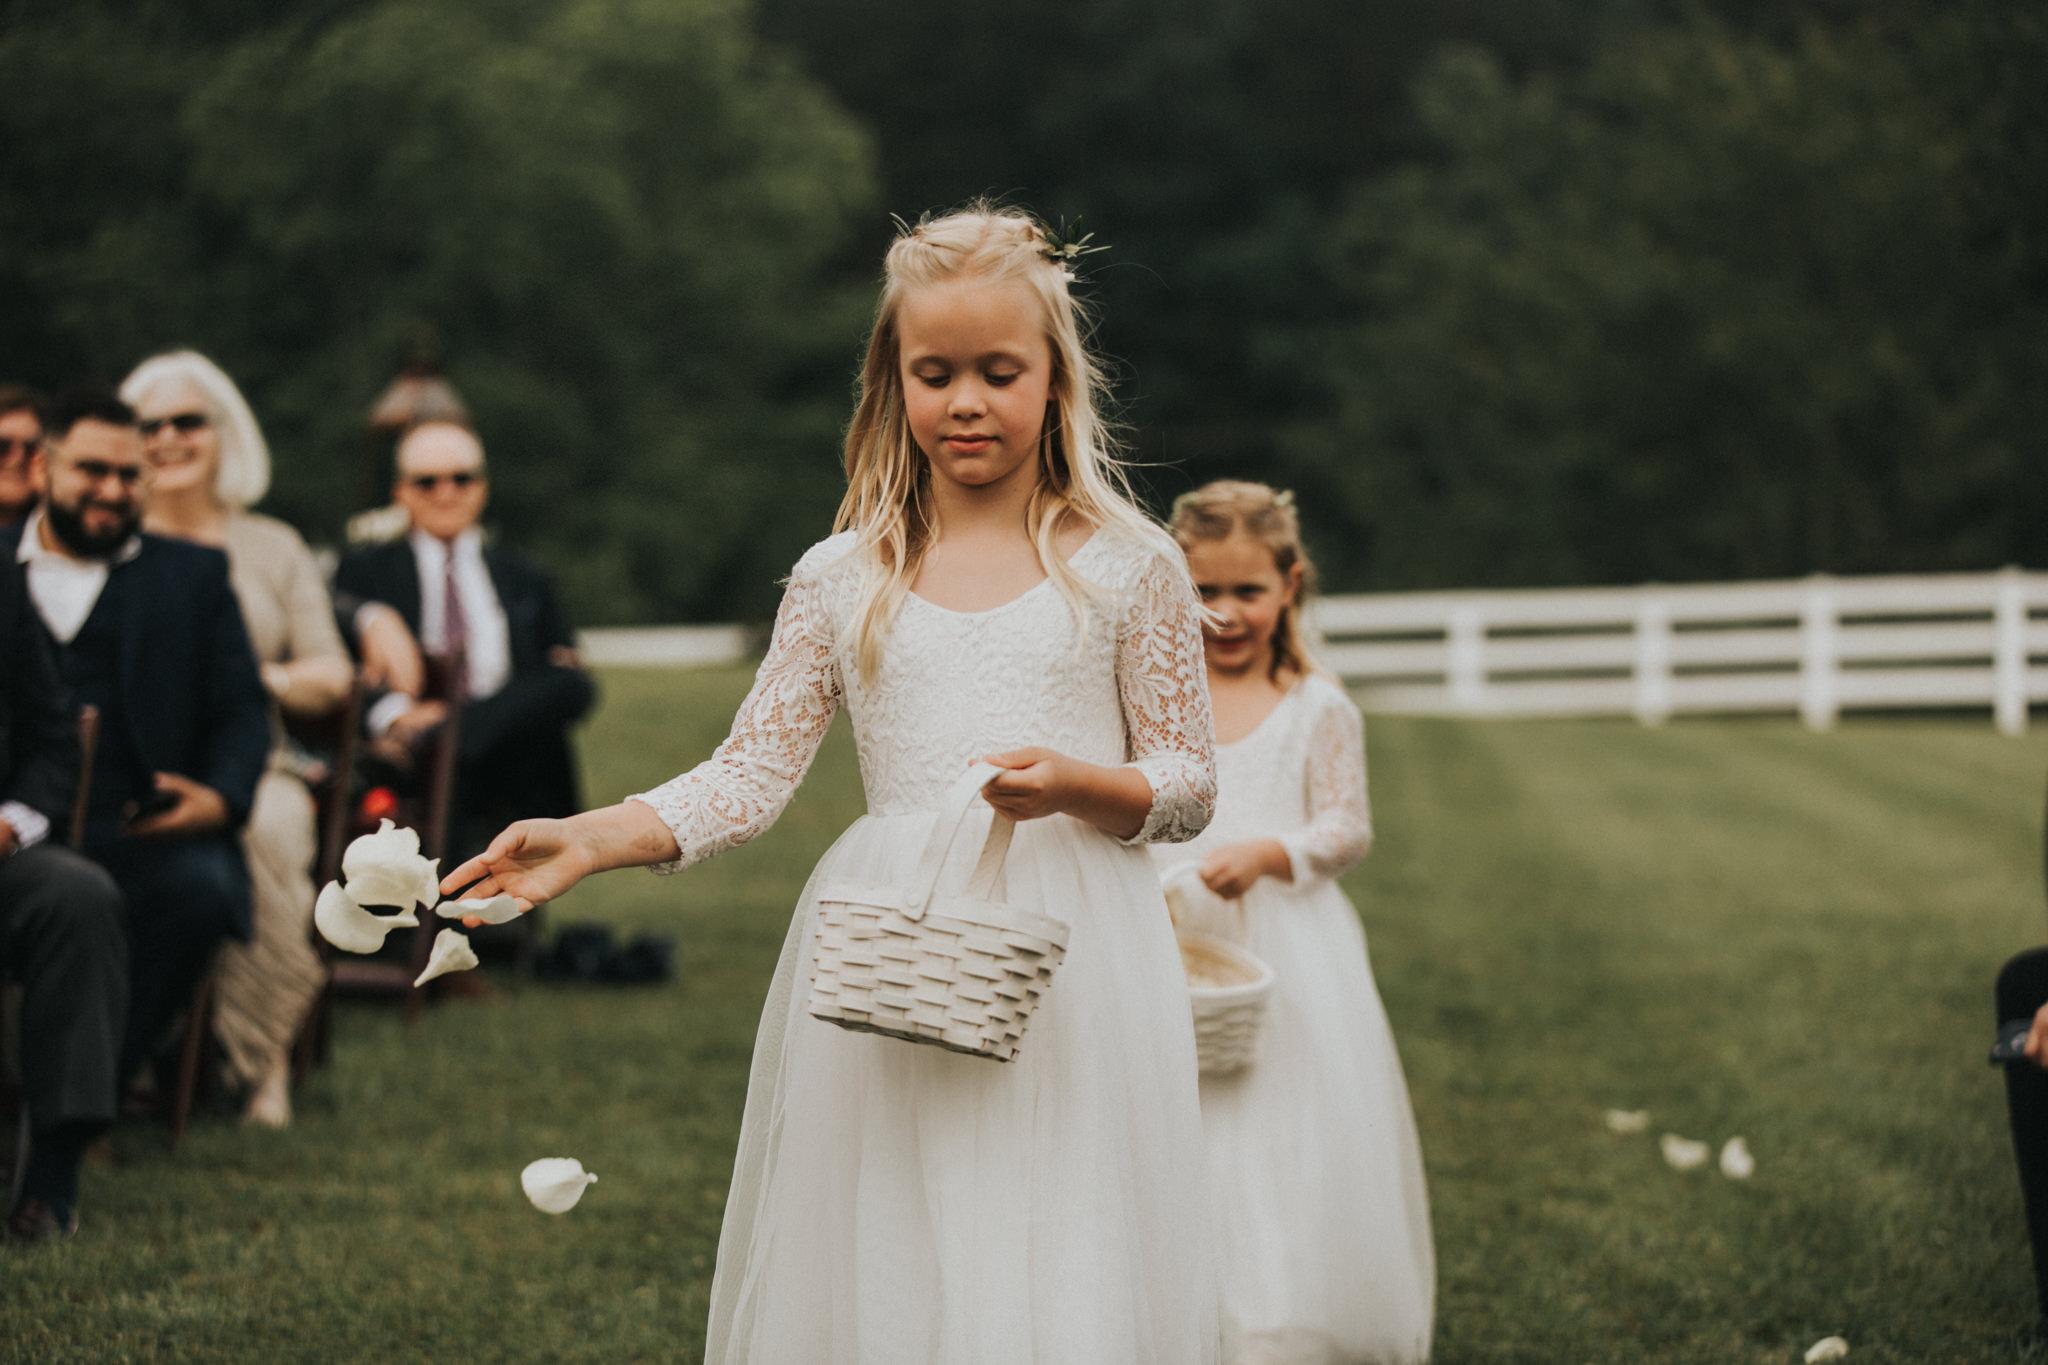 KateMatt-North-Georgia-Wedding-Photographer-Mountain-Laurel-Farm-94.jpg